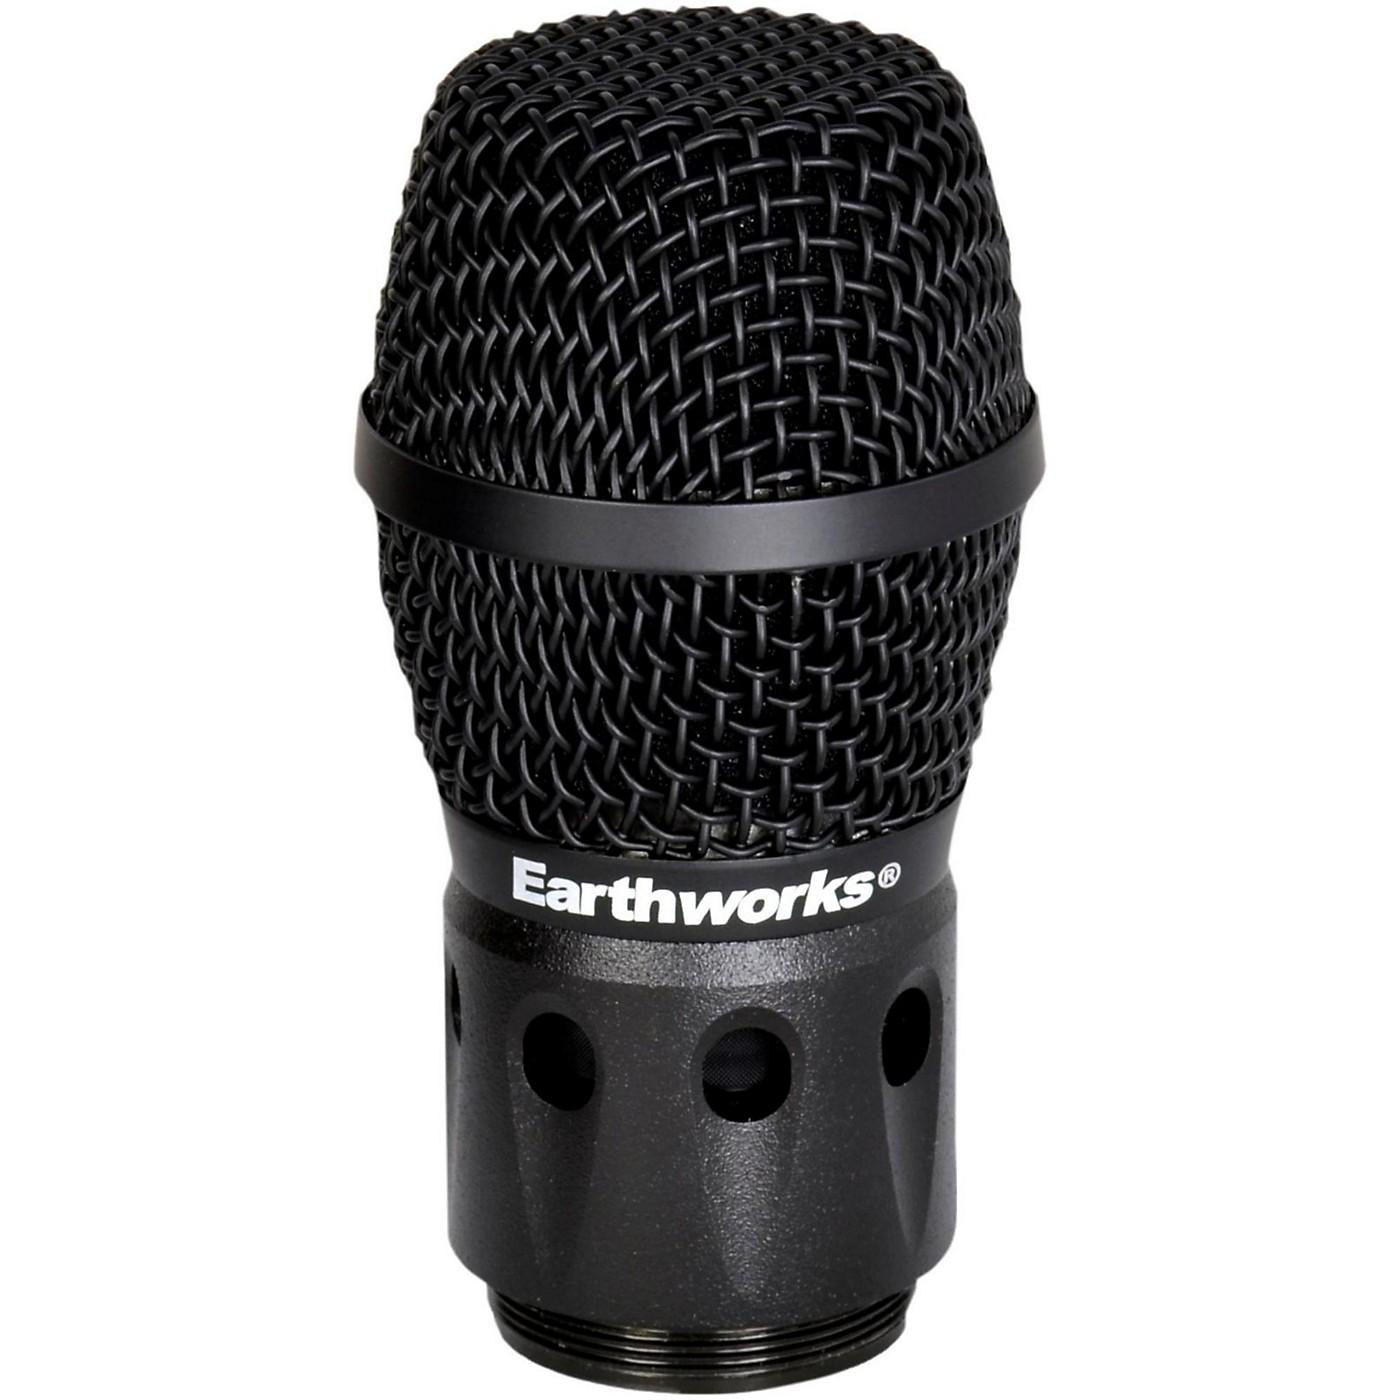 Earthworks WL40V Wireless Microphone Capsule thumbnail